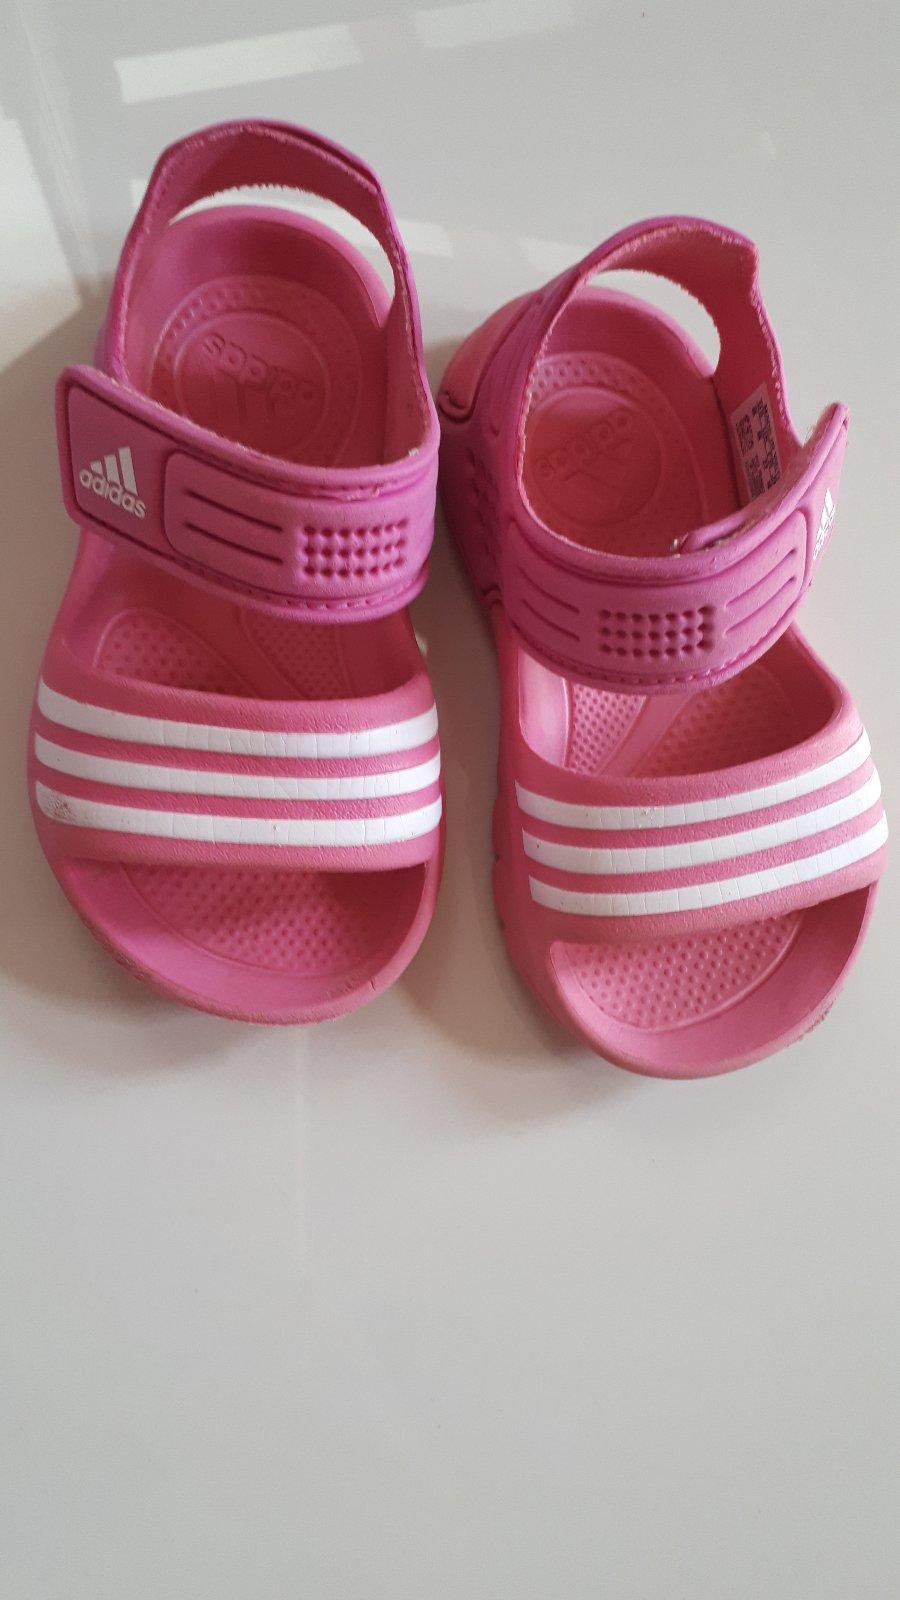 Detské sandalky adidas 23 d3b1562f37c